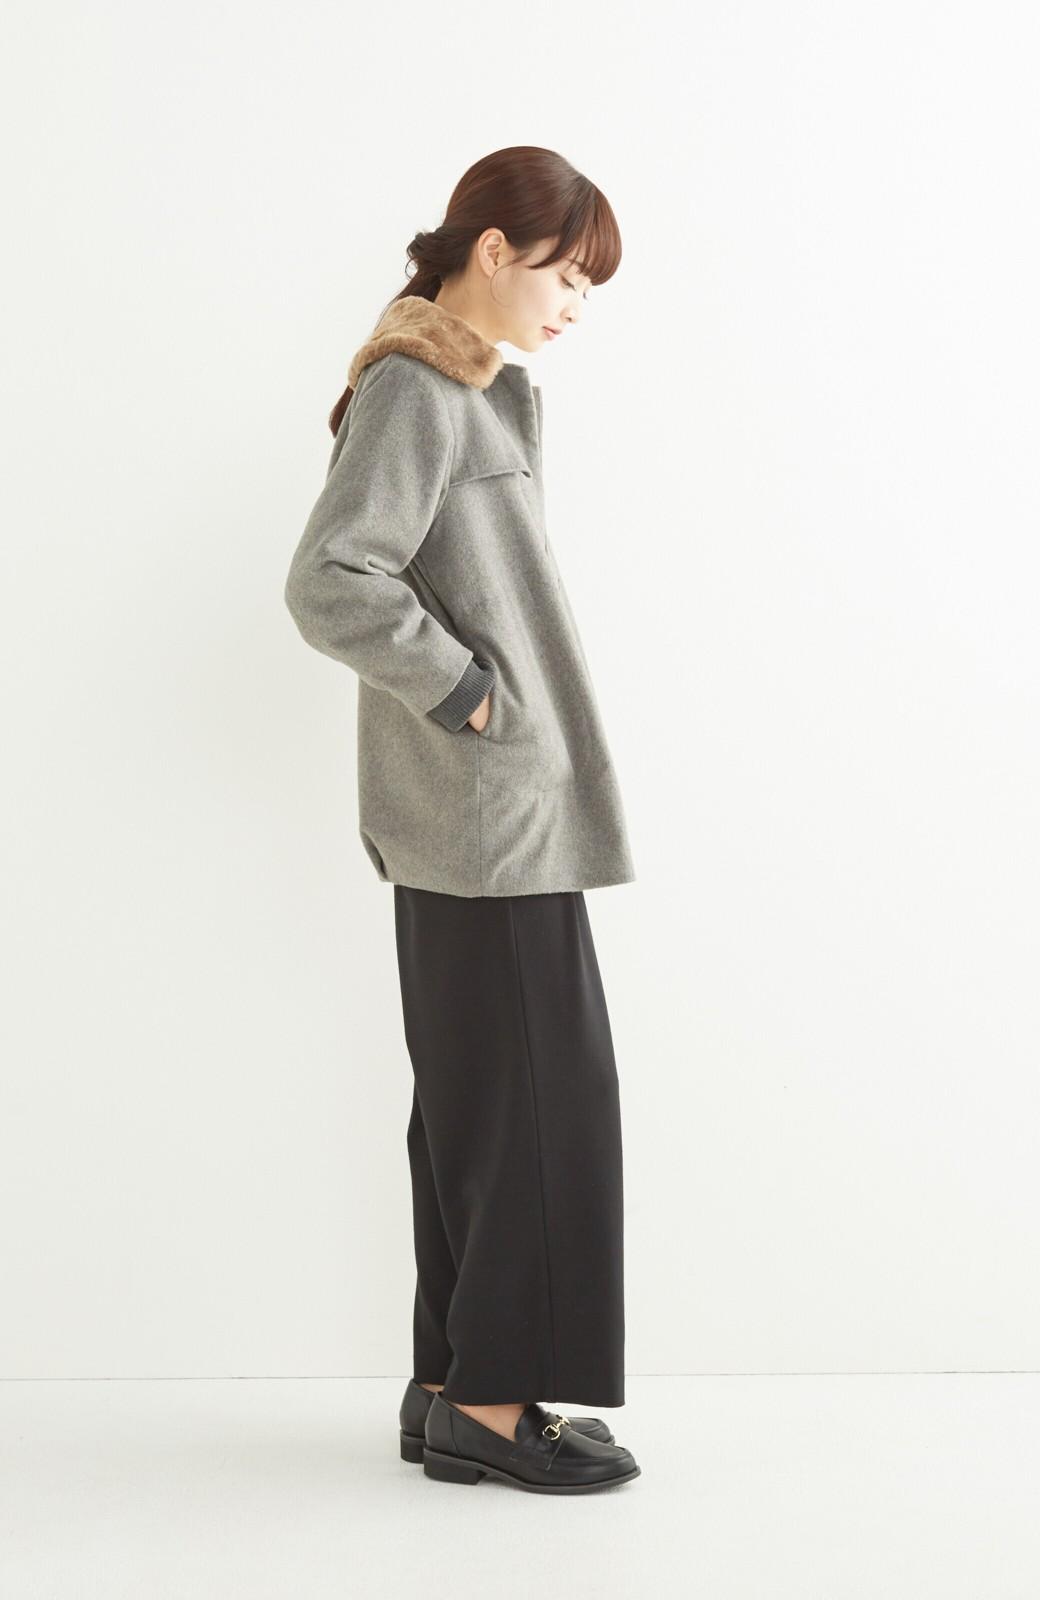 pilvee 取り外しフェイクファー衿付き ウール混のノーカラーコート <グレー>の商品写真10